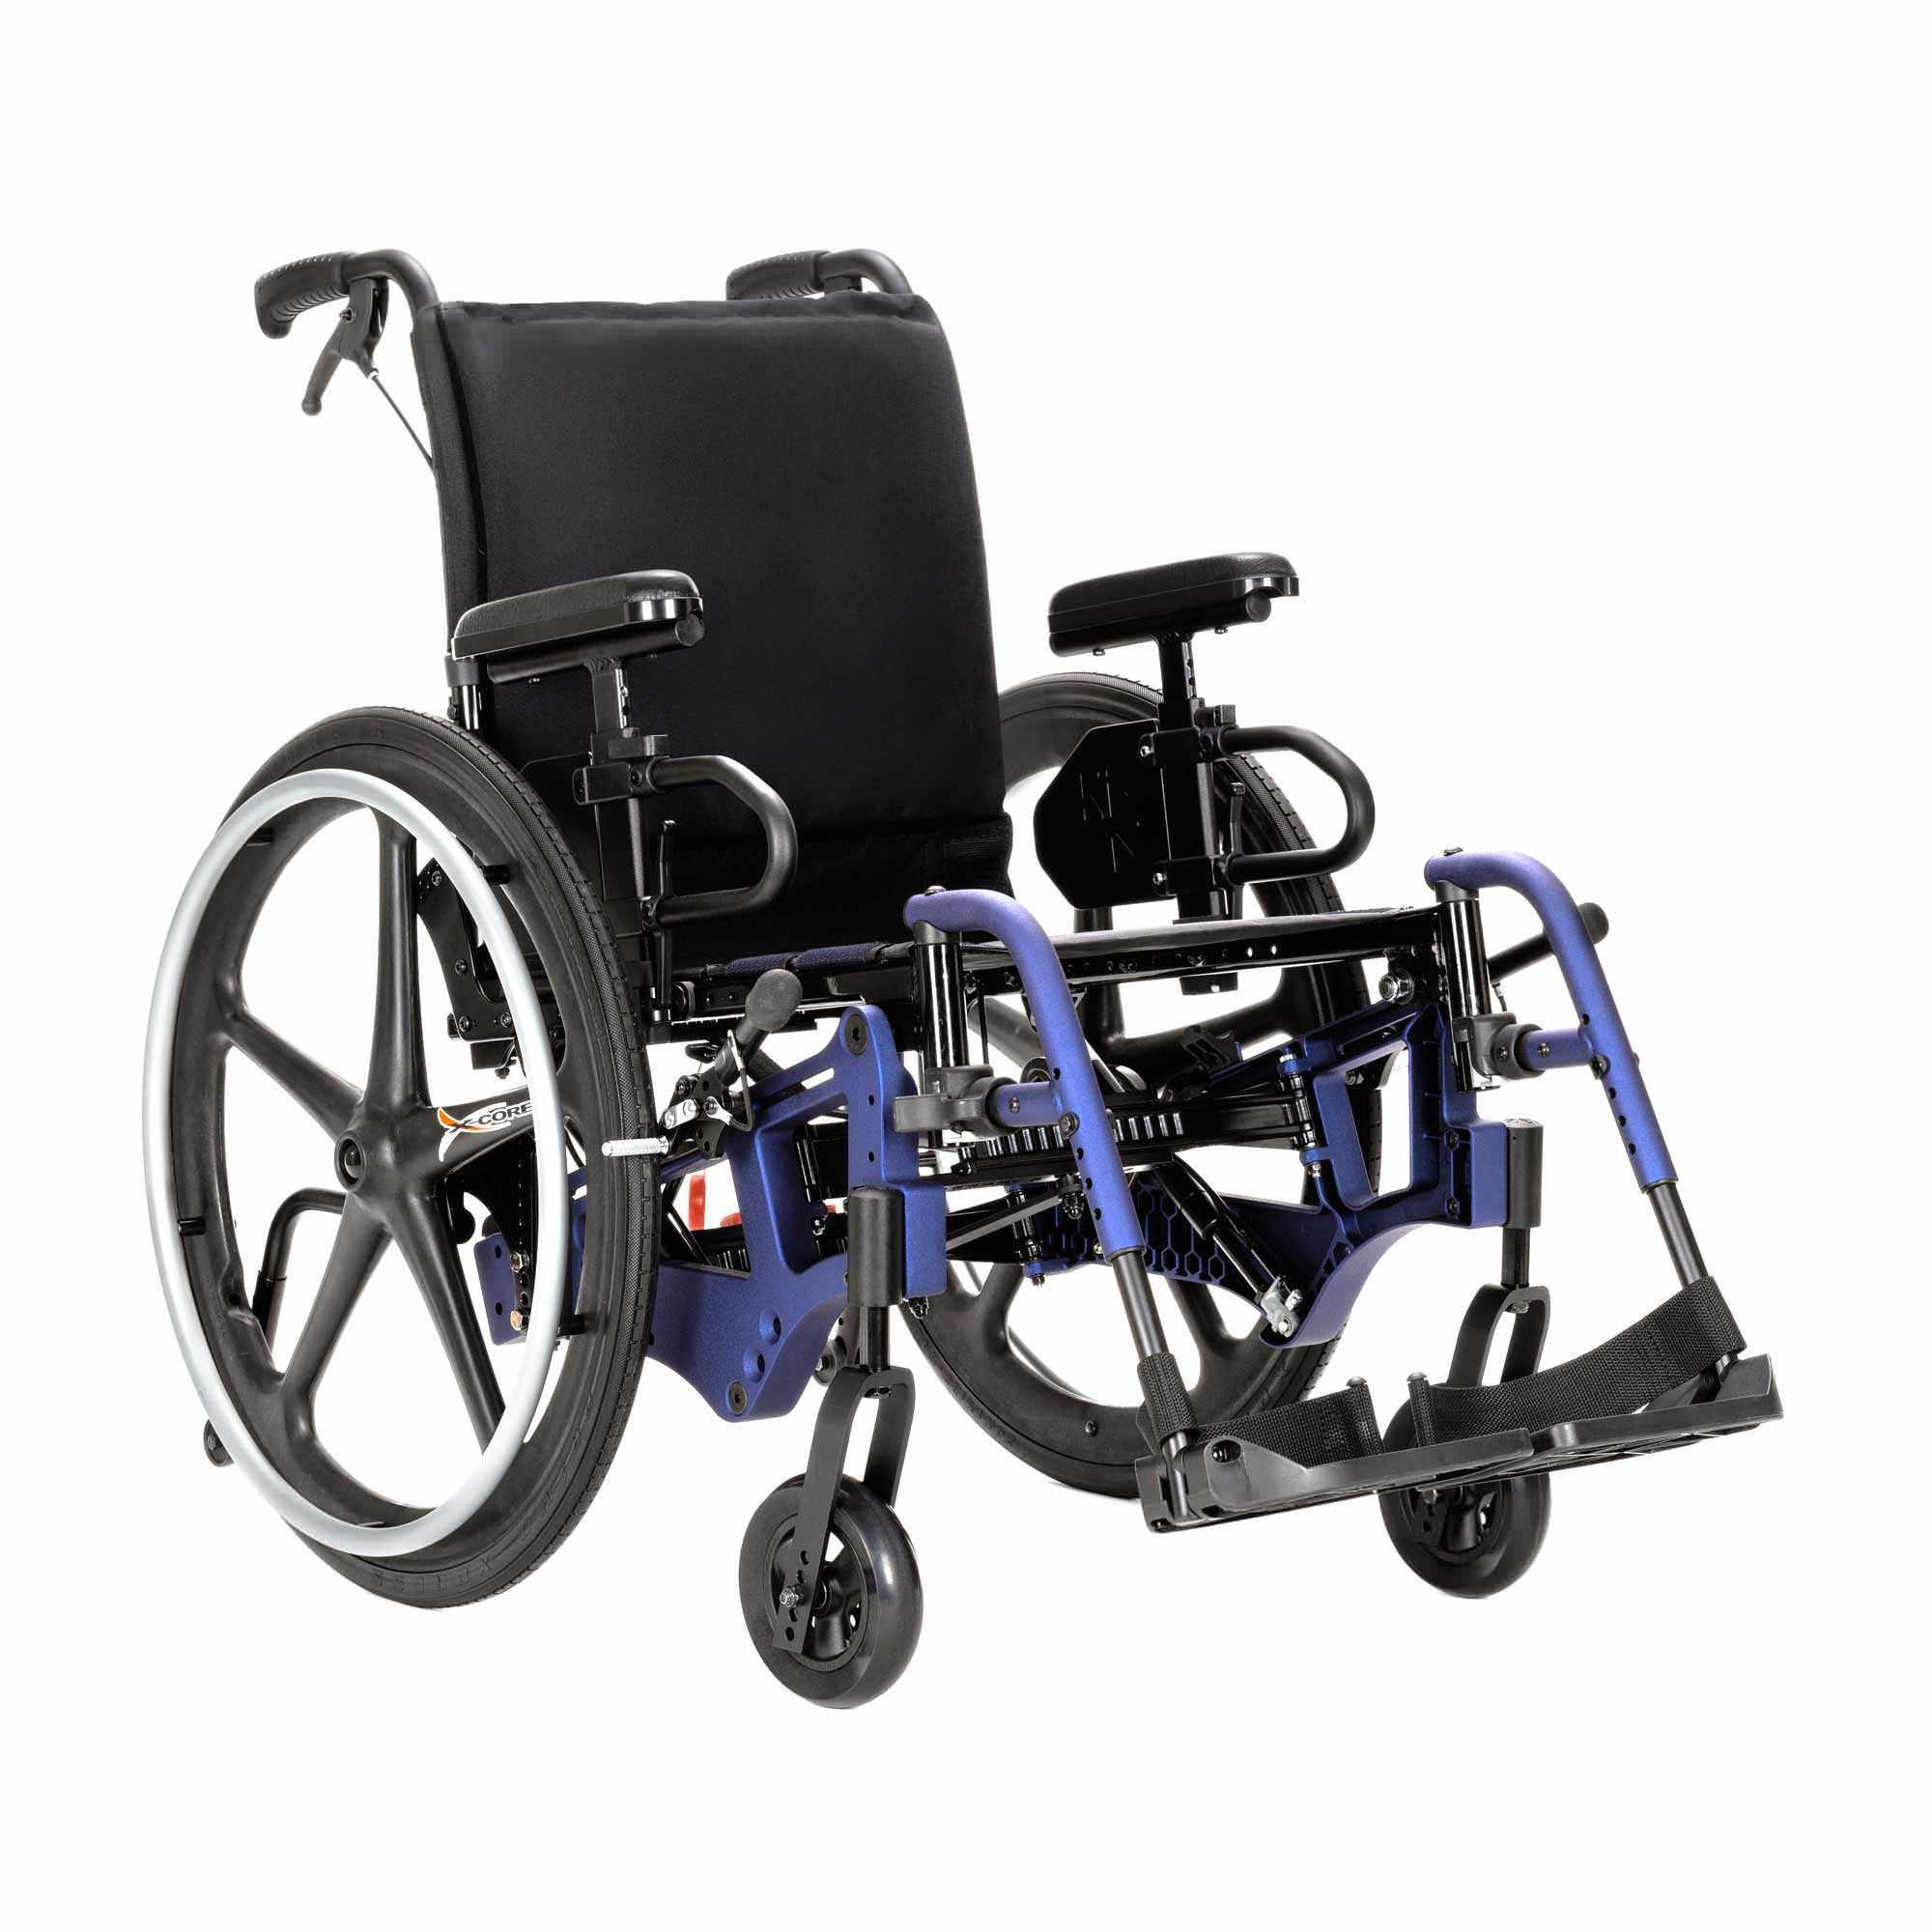 Ki mobility Liberty FT tilt wheelchair